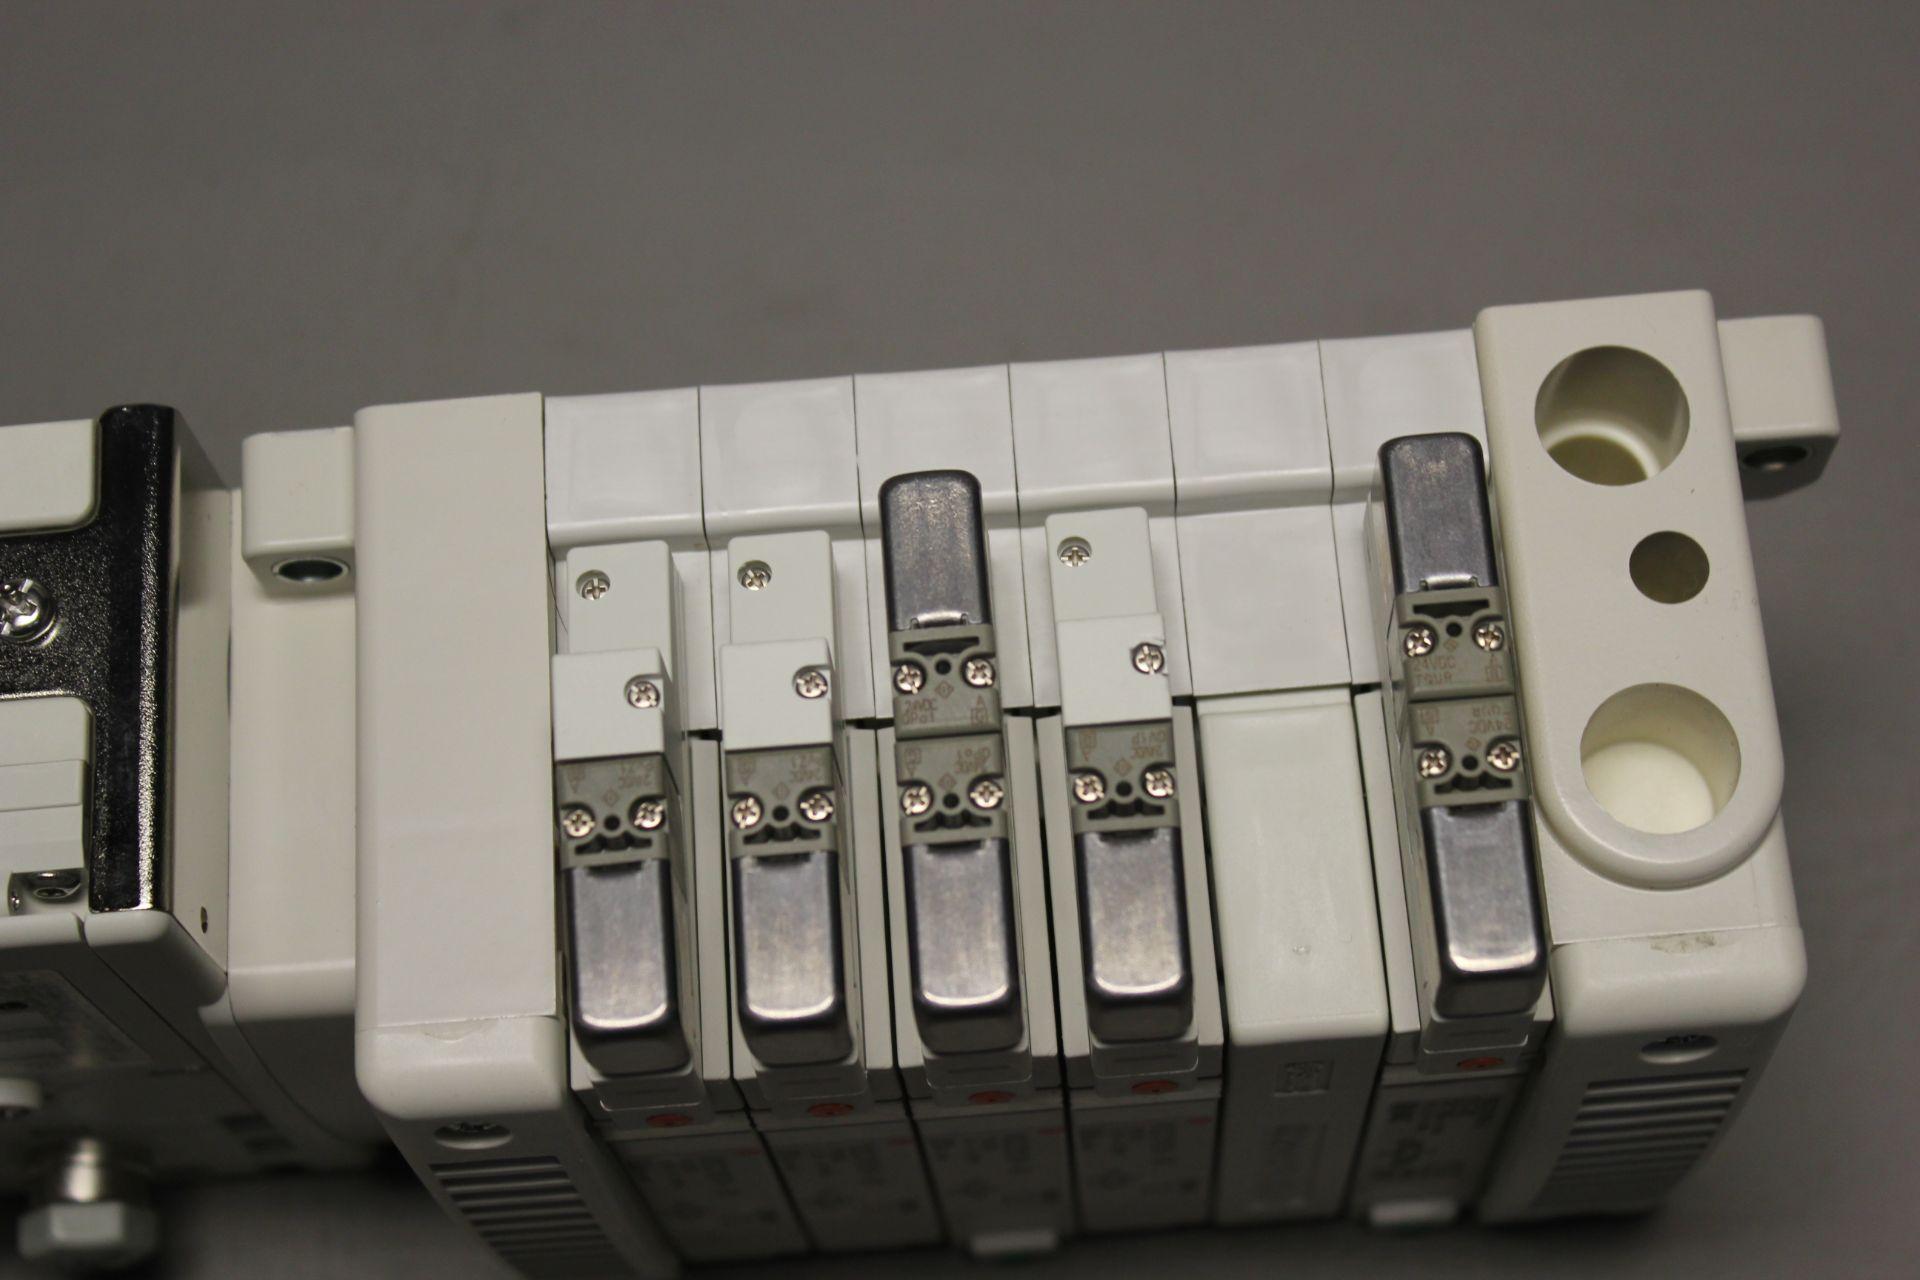 NEW SMC MANIFOLD WITH SOLENOID VALVES, ETHERNET/IP I/O - Image 5 of 8